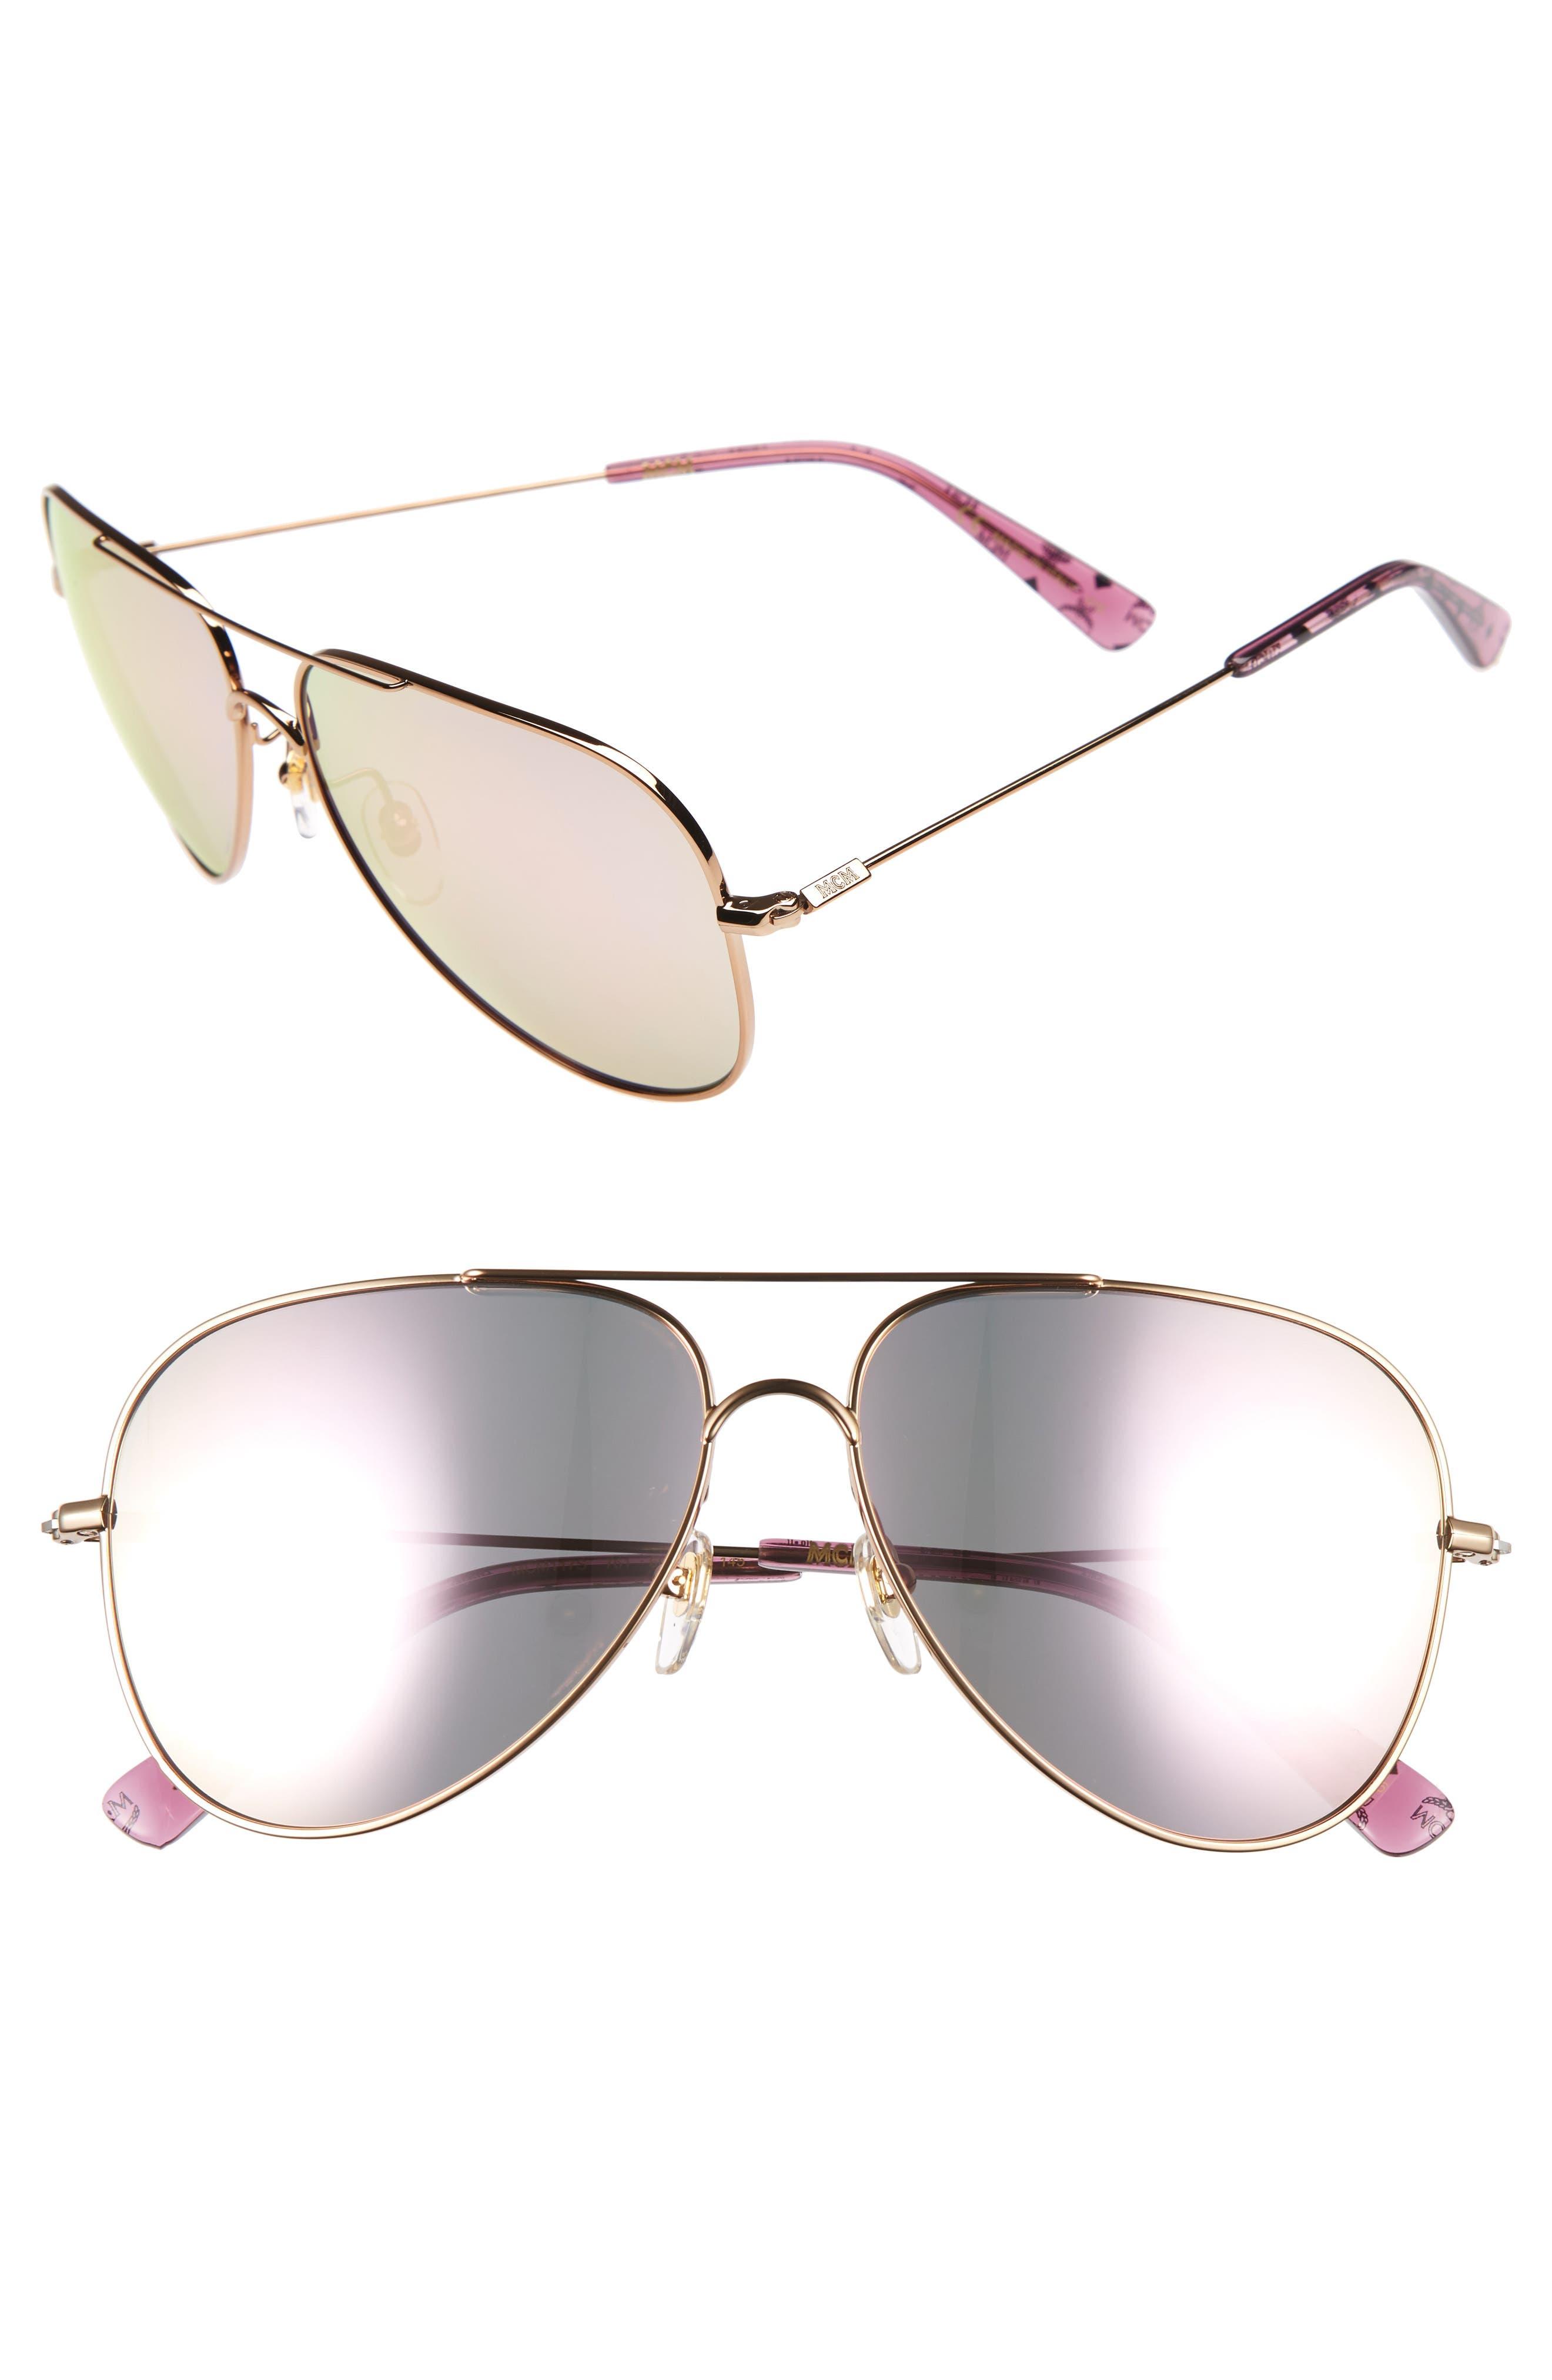 60mm Aviator Sunglasses,                             Alternate thumbnail 2, color,                             AMBER